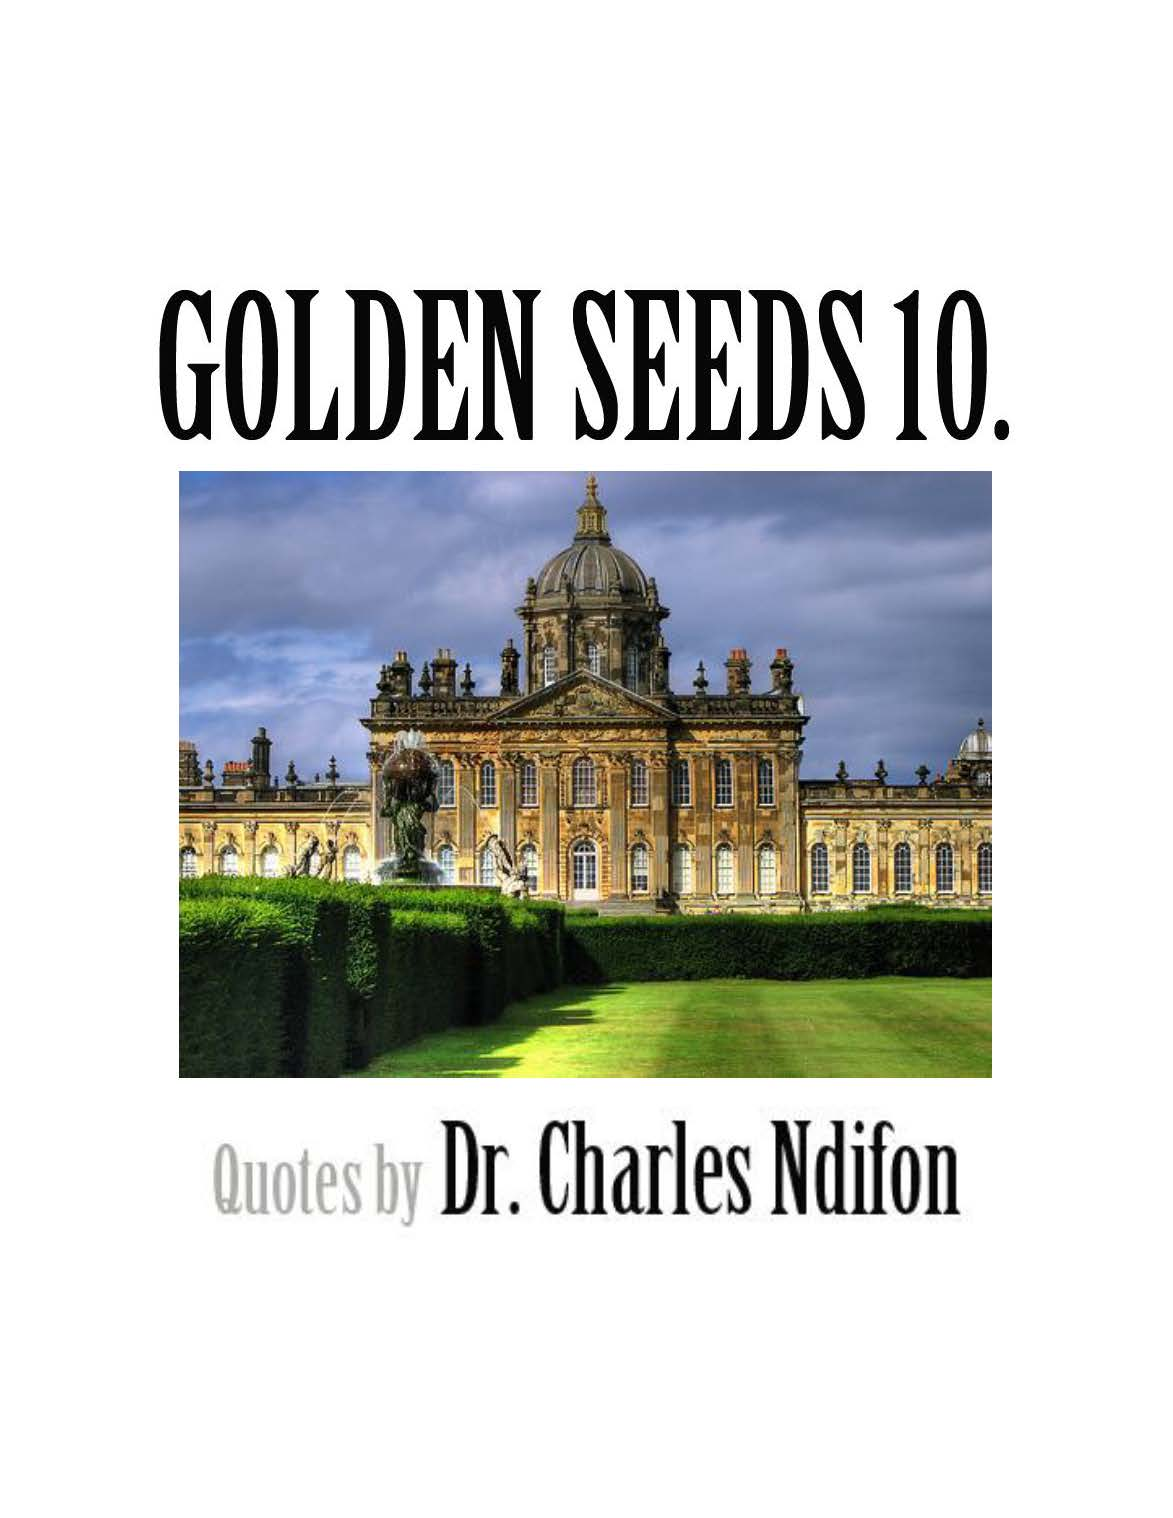 Golden Seeds Series 1-10